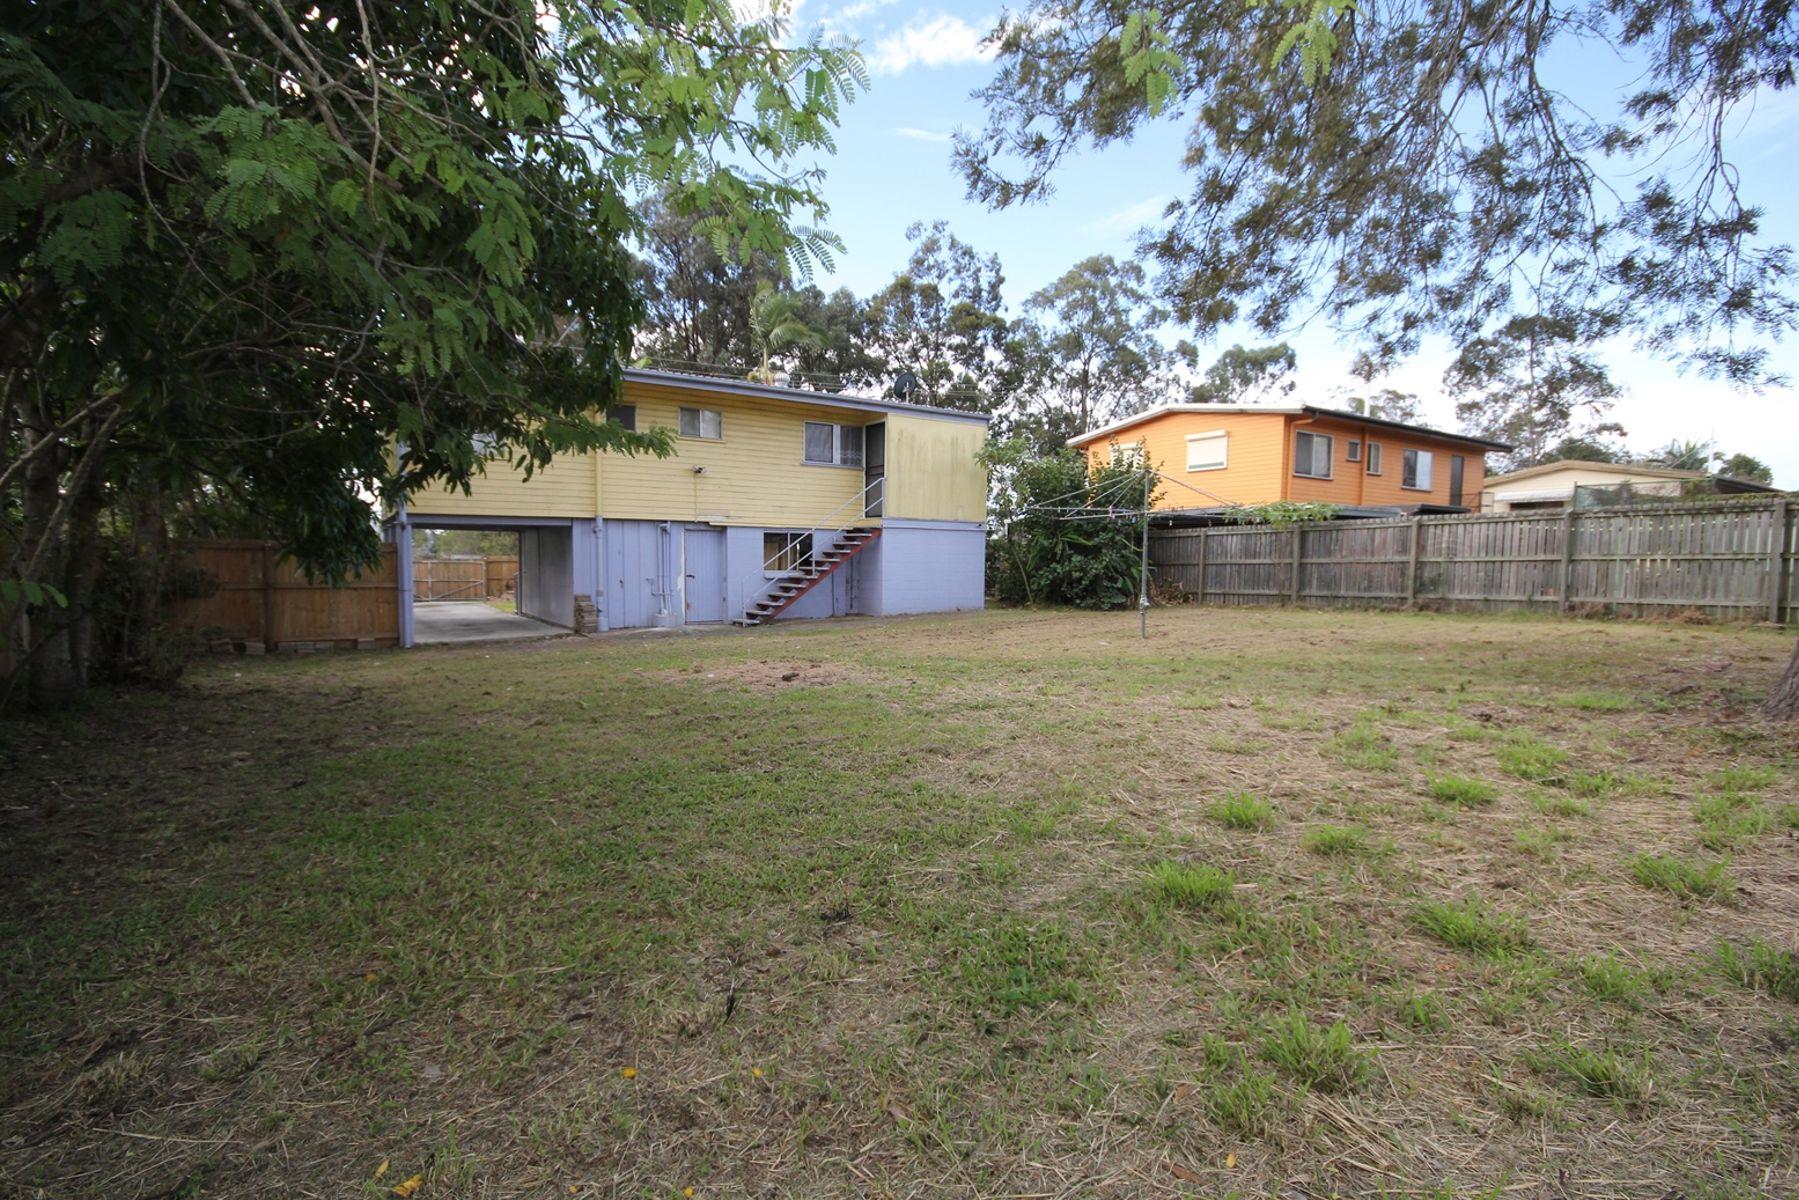 273 Waterford Road, Ellen Grove, QLD 4078